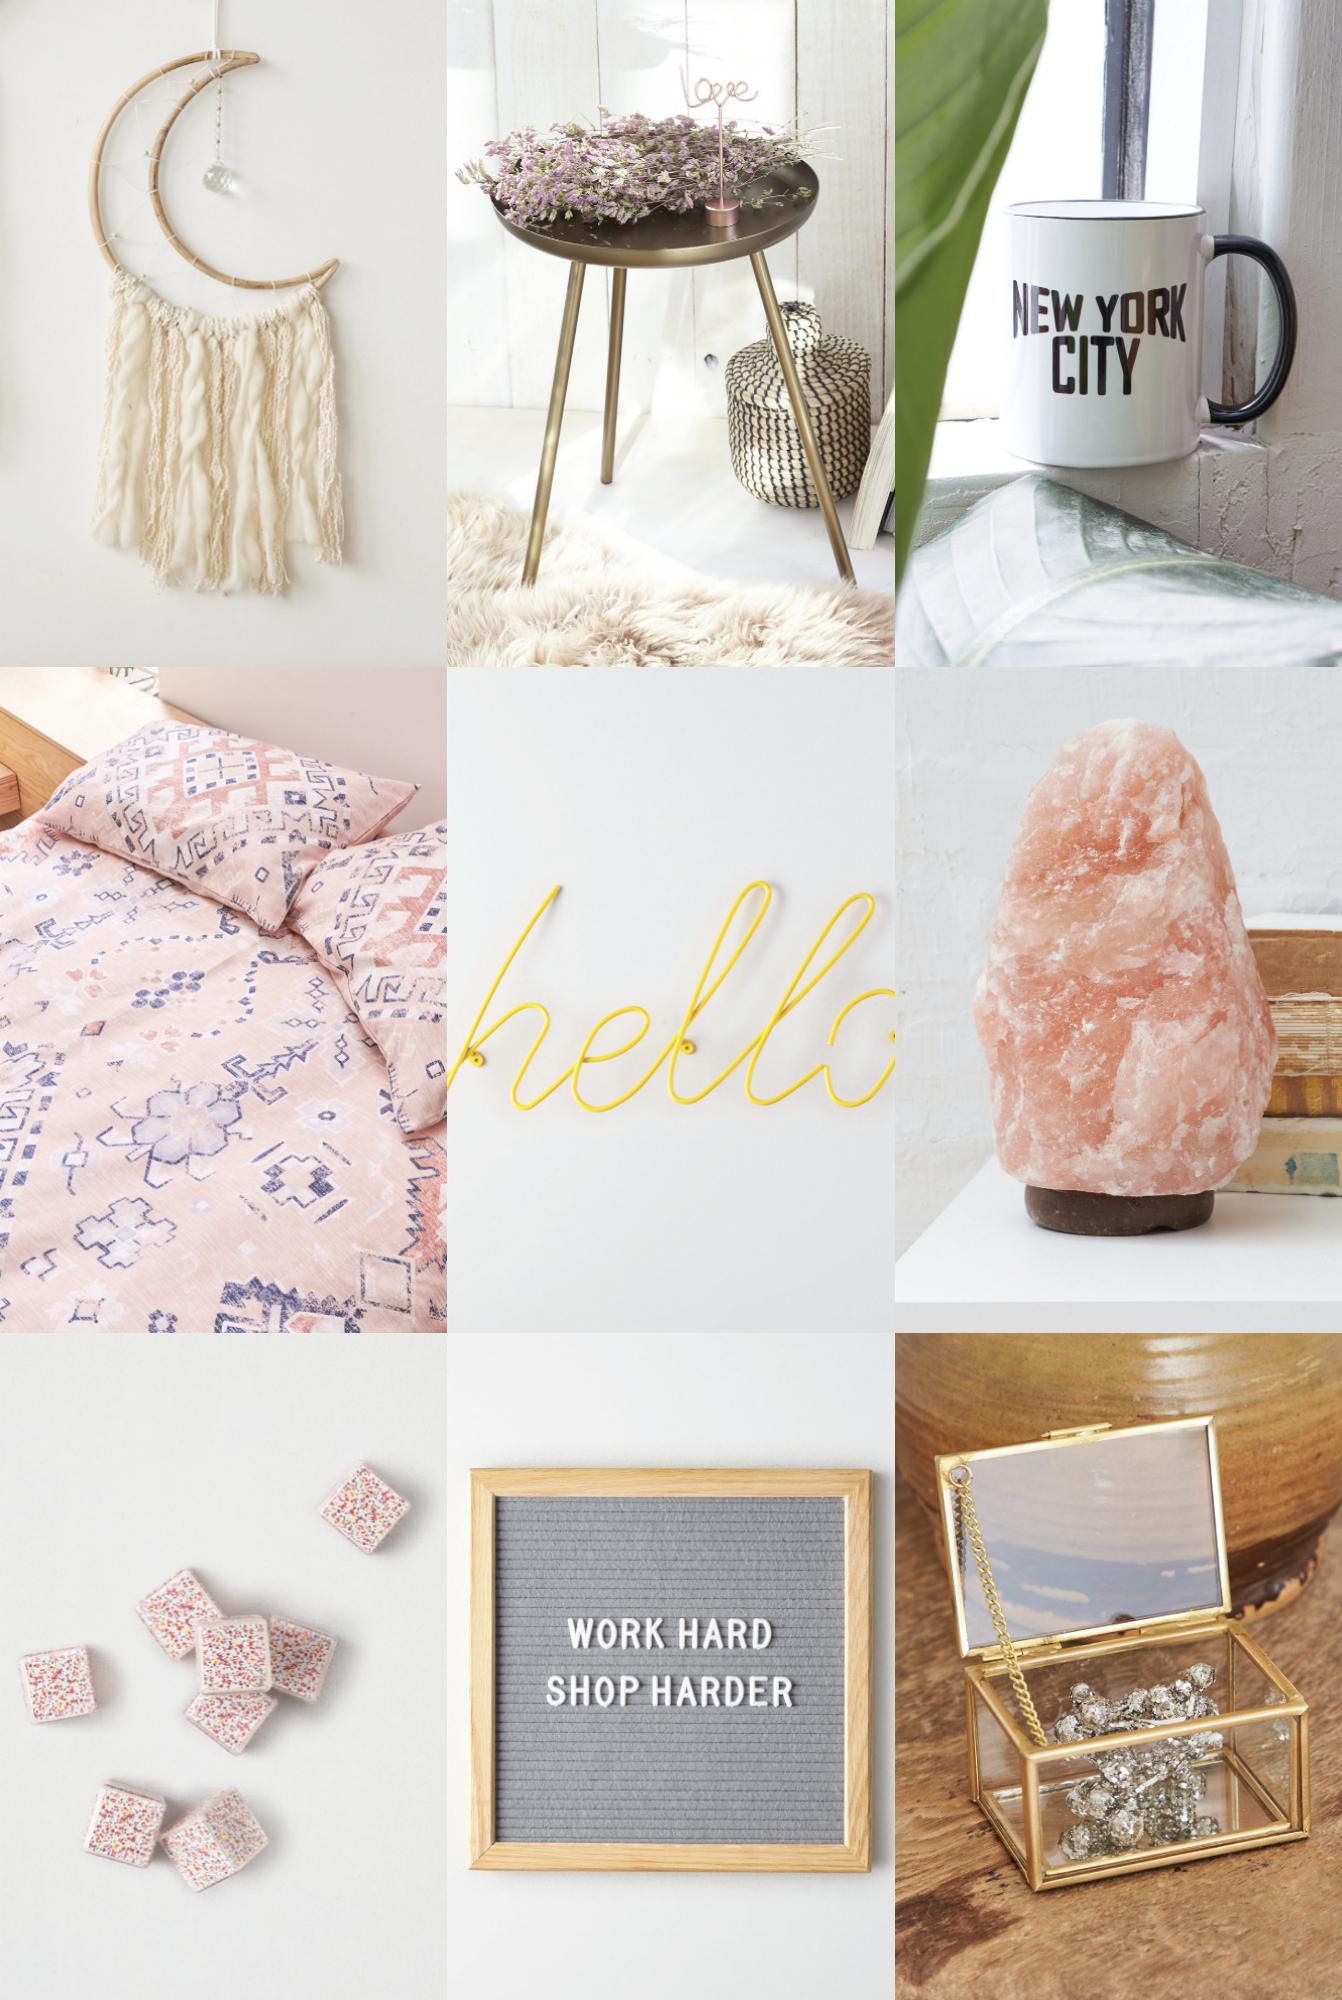 Mash Elle lifestyle blogger | home design | home decor | hello neon sign | room inspo | salt lamp